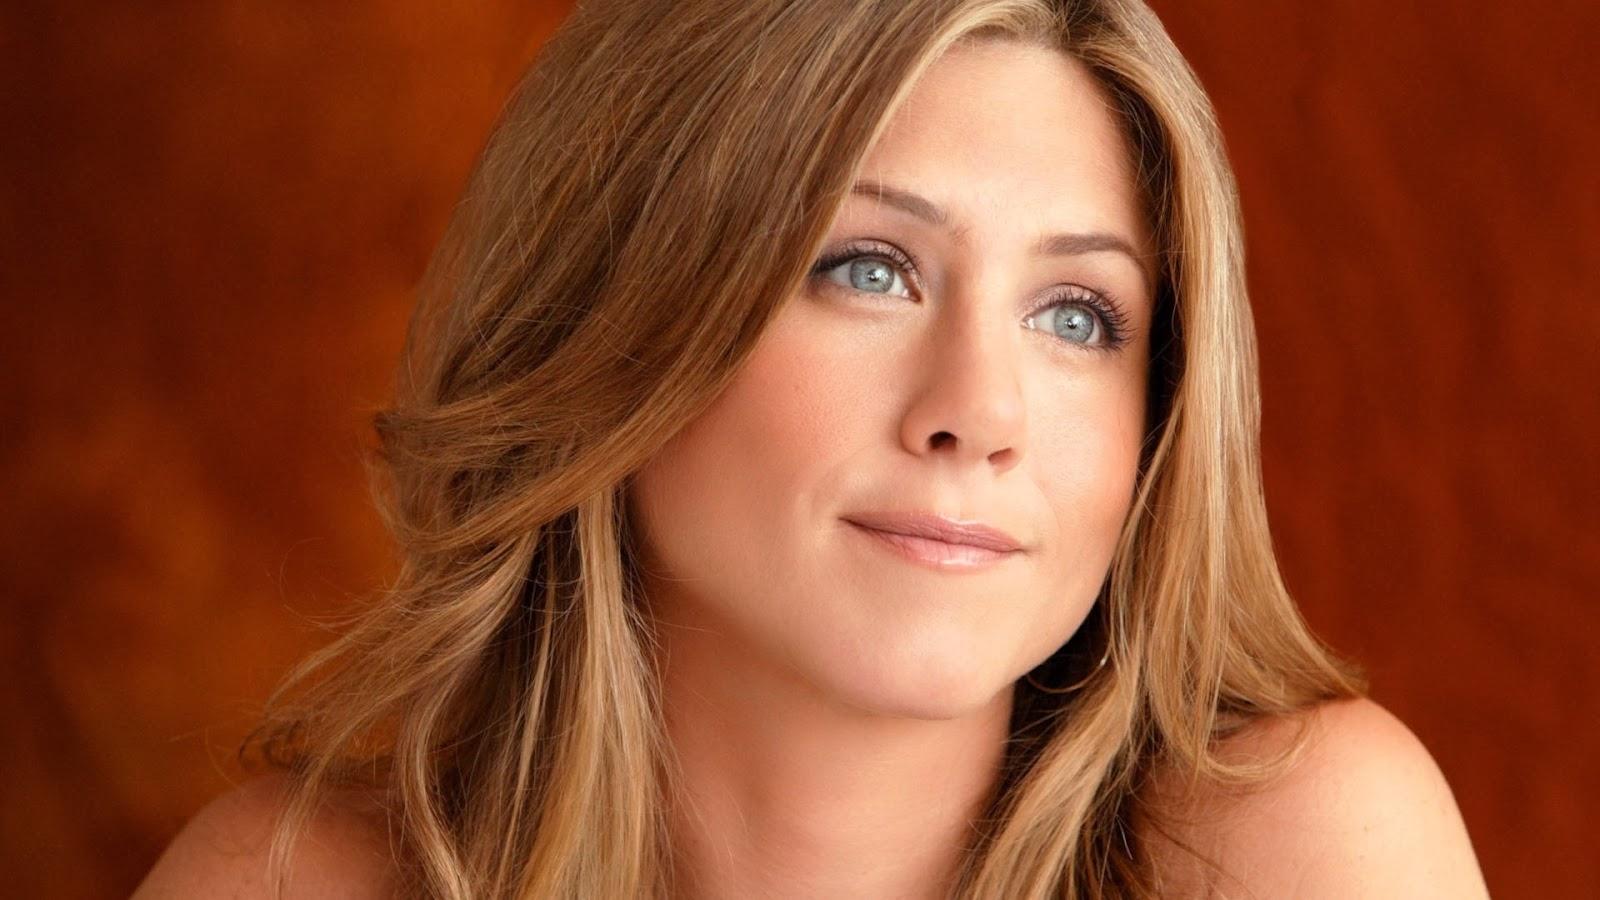 Trucos de belleza de Jennifer Aniston